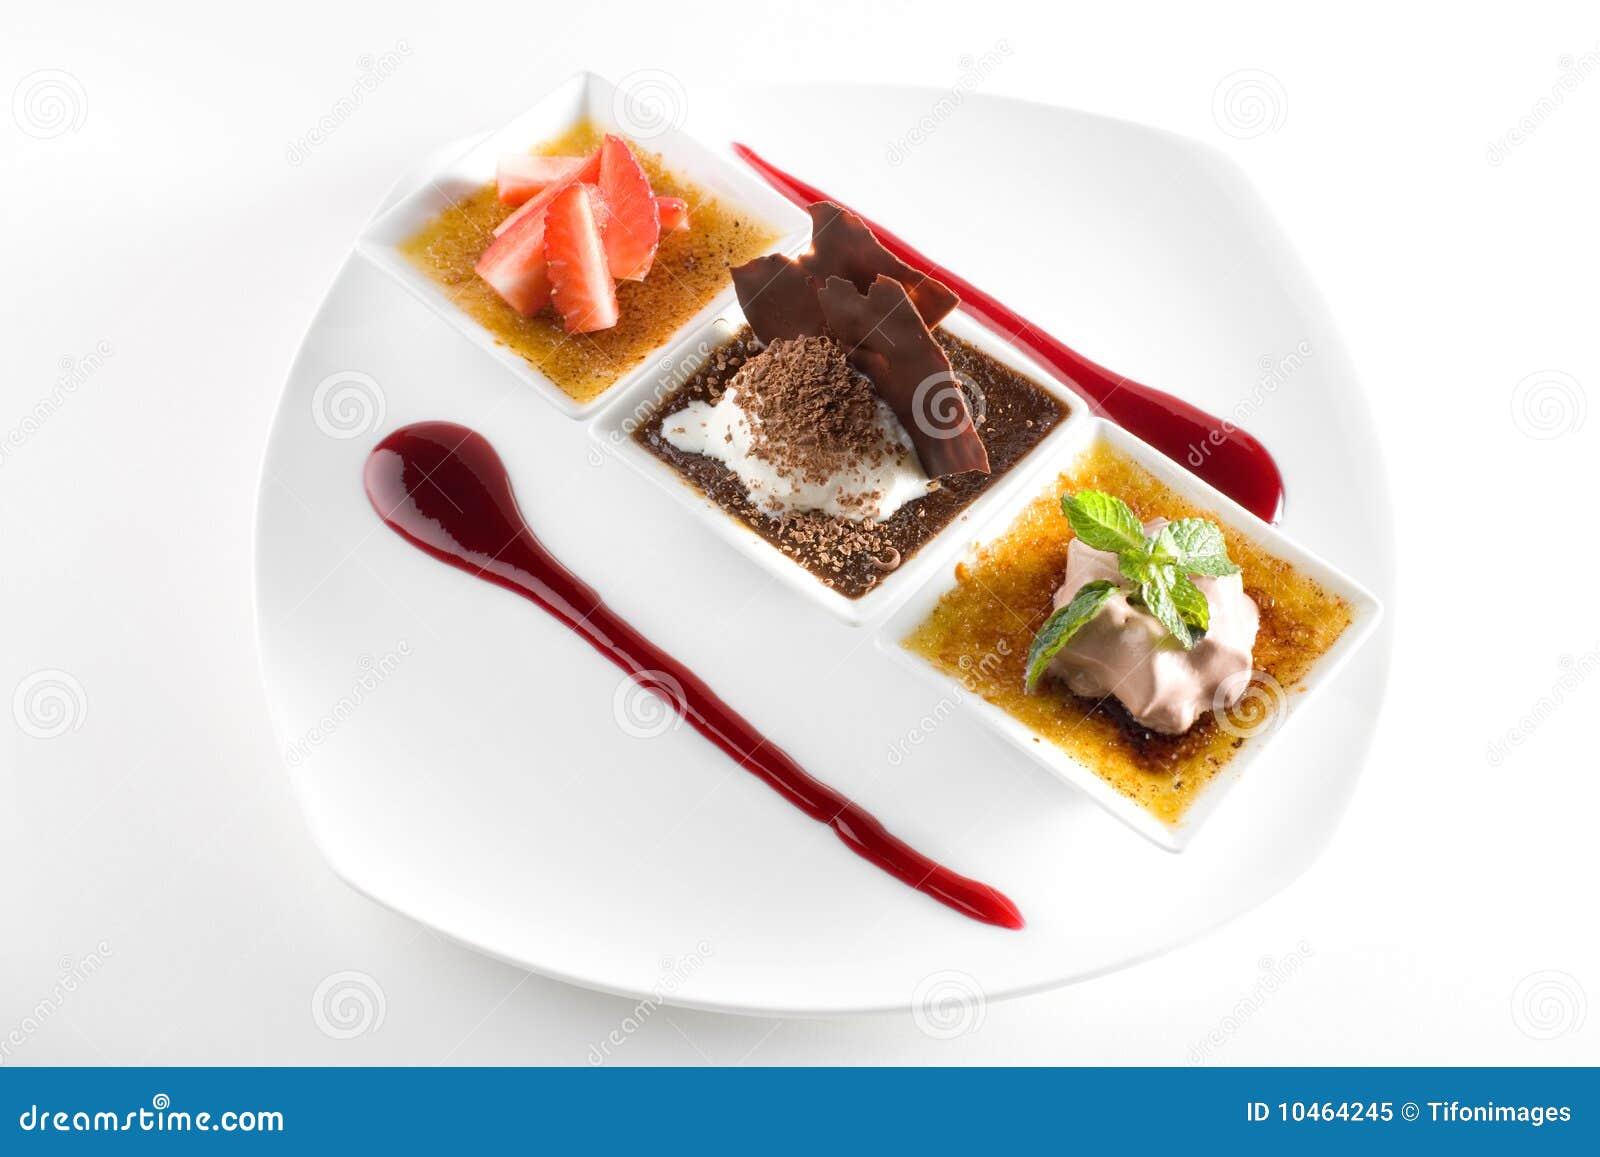 Stylish Gourmet Dessert Royalty Free Stock Photo - Image ...